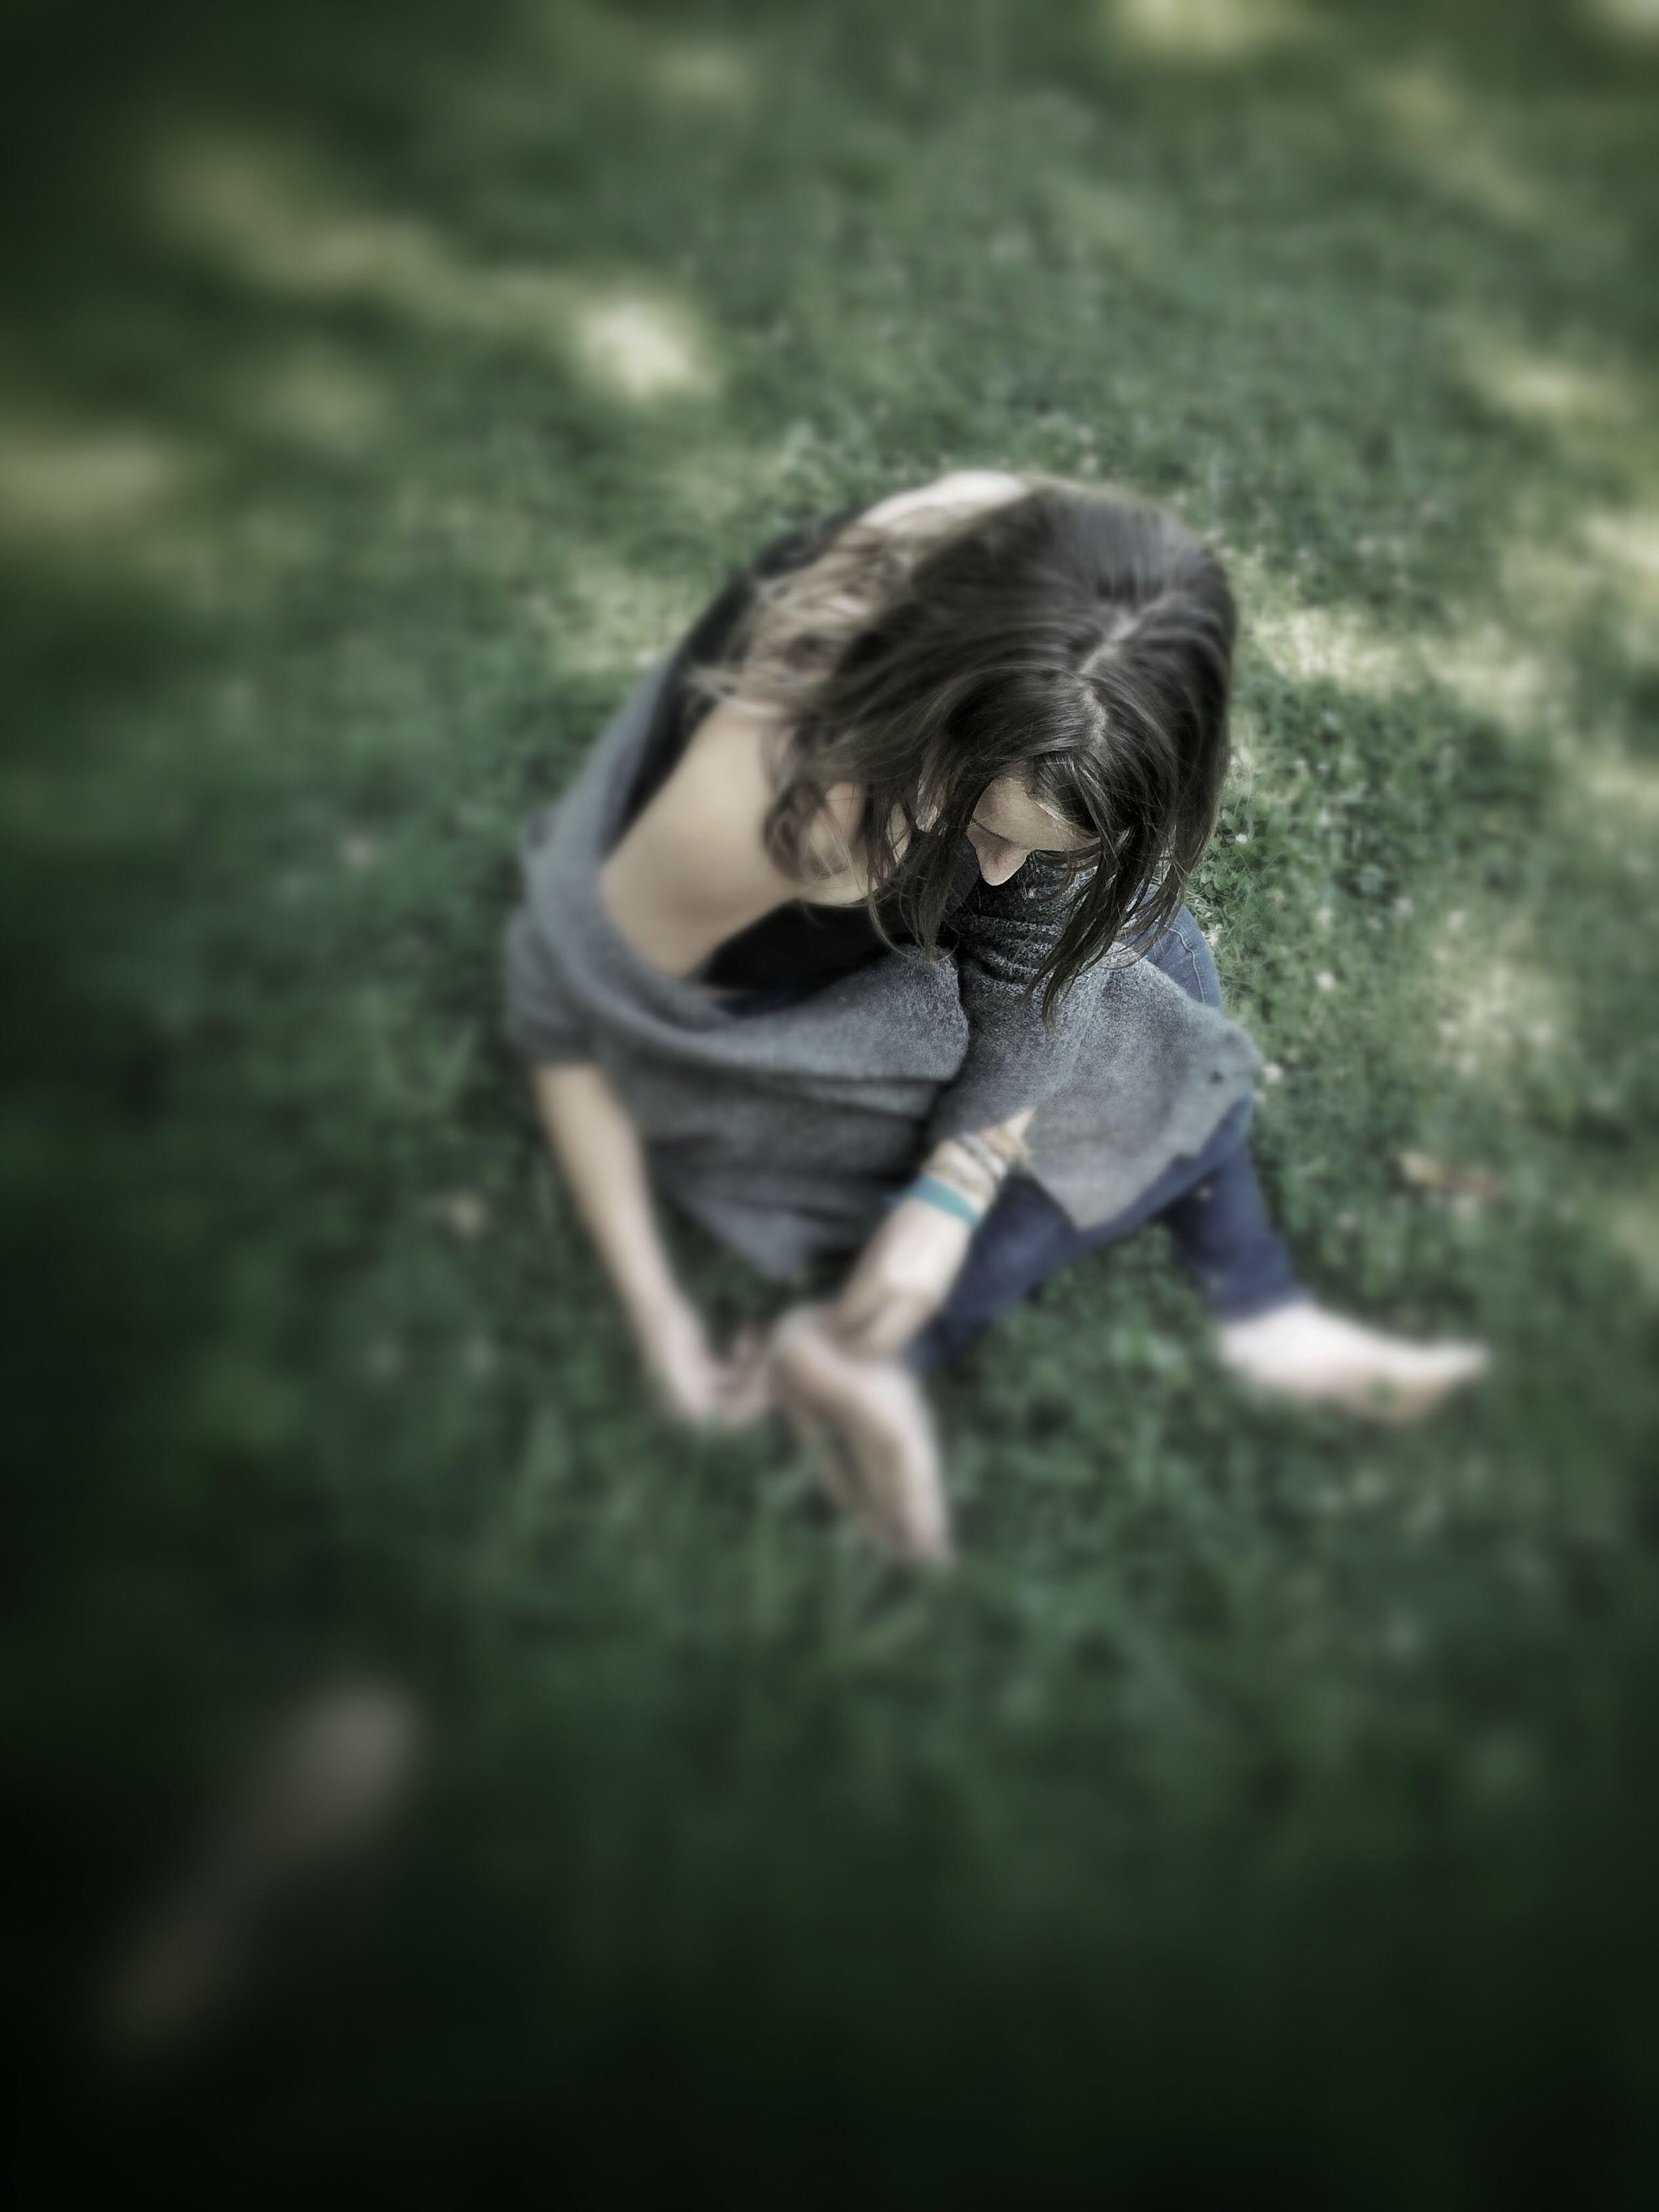 Young woman in park Portrait, Women, Image